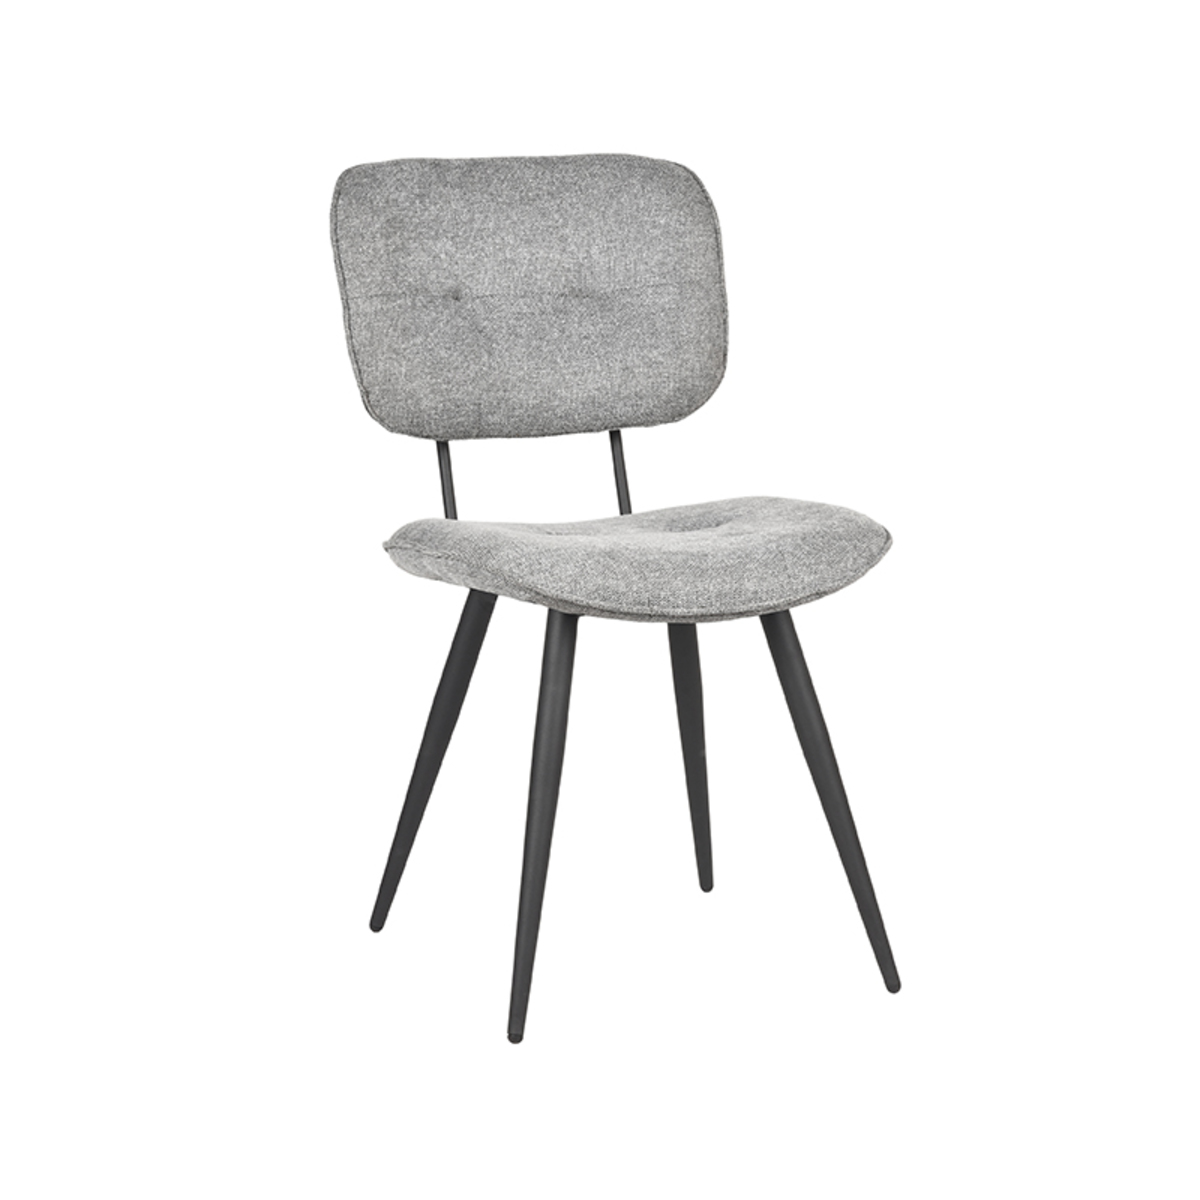 Eetkamerstoel Lux - Zinc - Weave